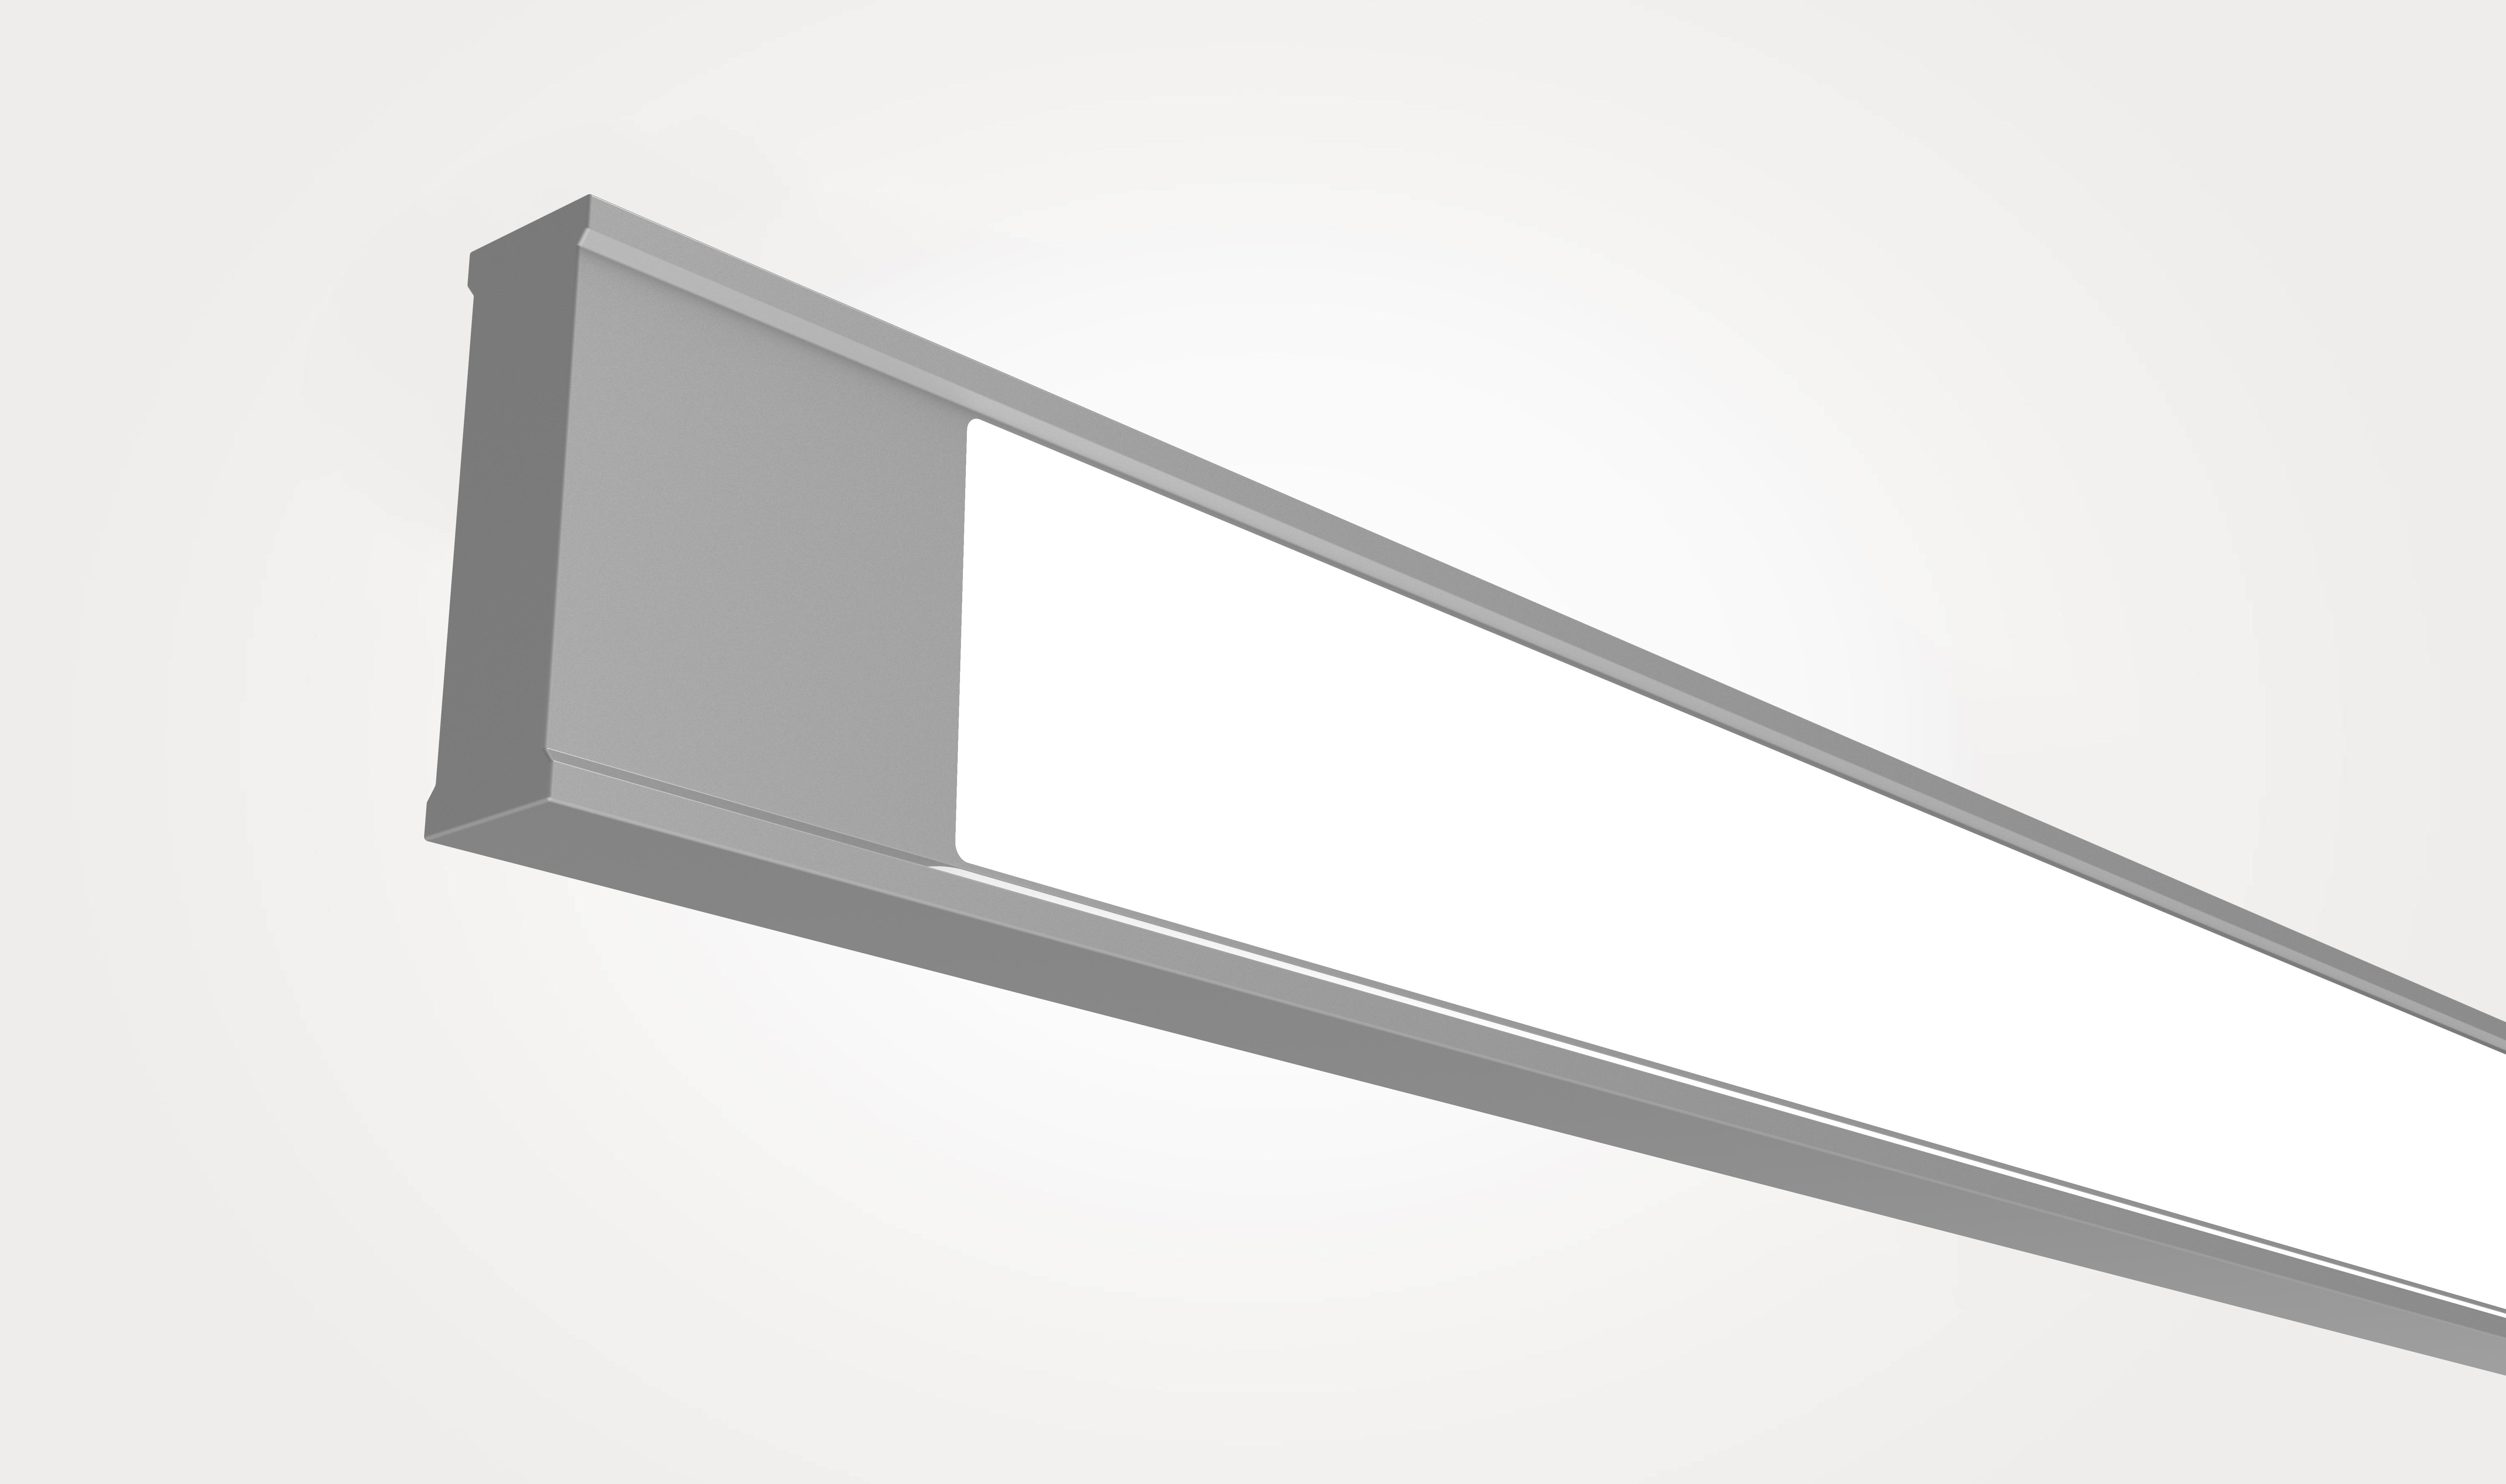 Vertical Wall Wash Suspended Linear_Flat Endcap.jpg